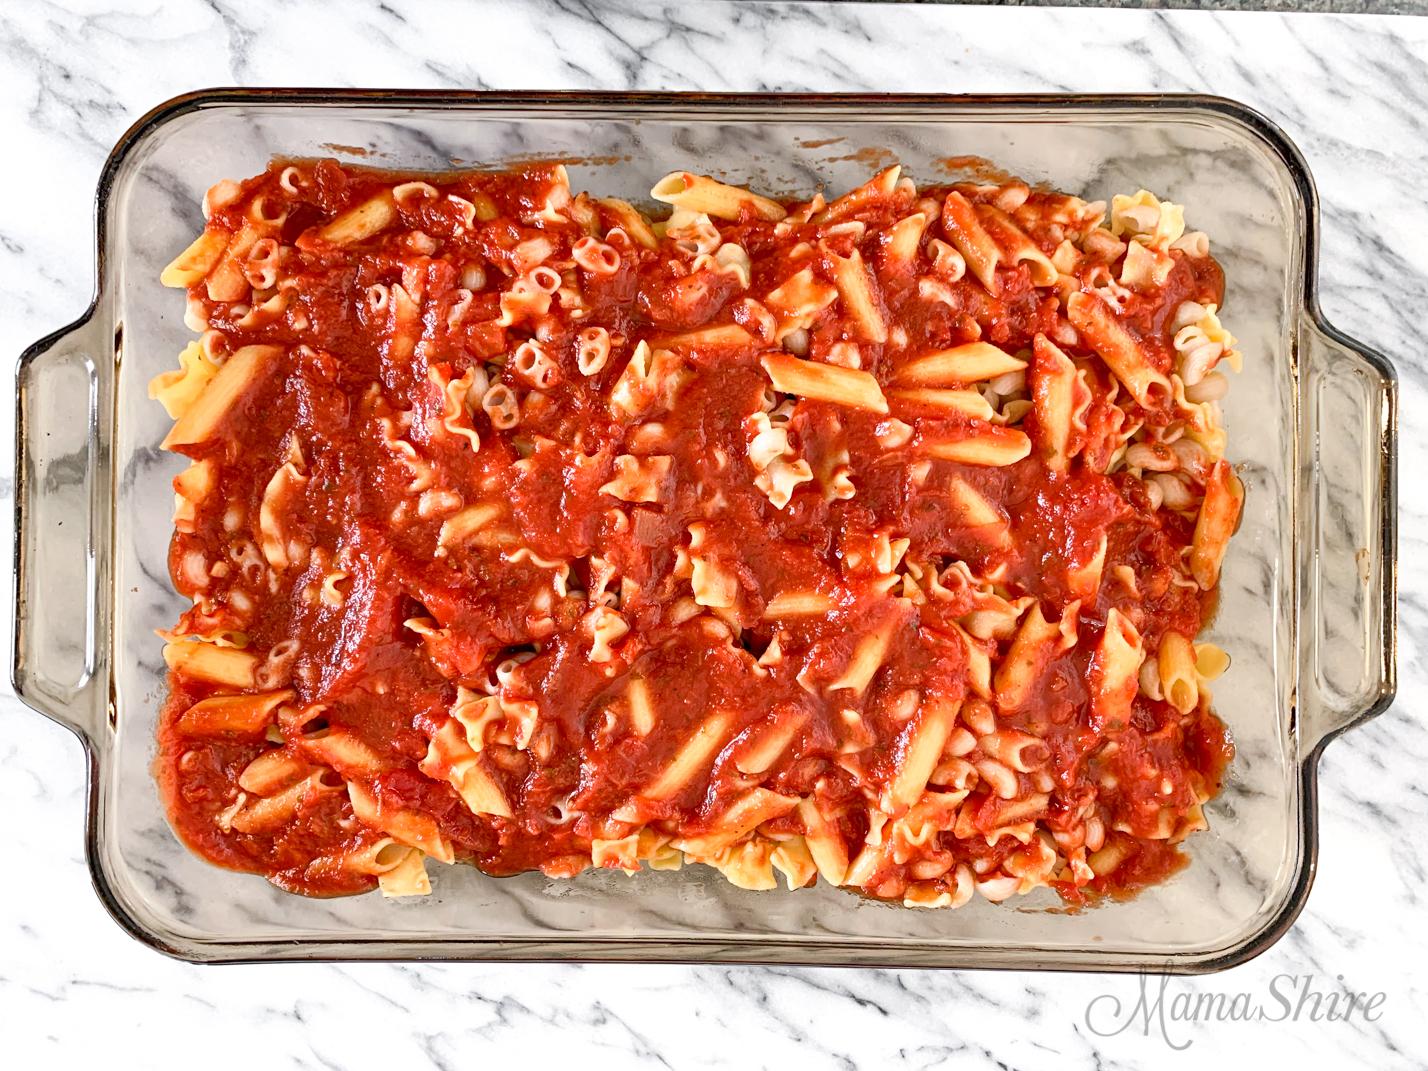 Three types of gluten-free pasta with spaghetti sauce for a gluten-free cavatini.